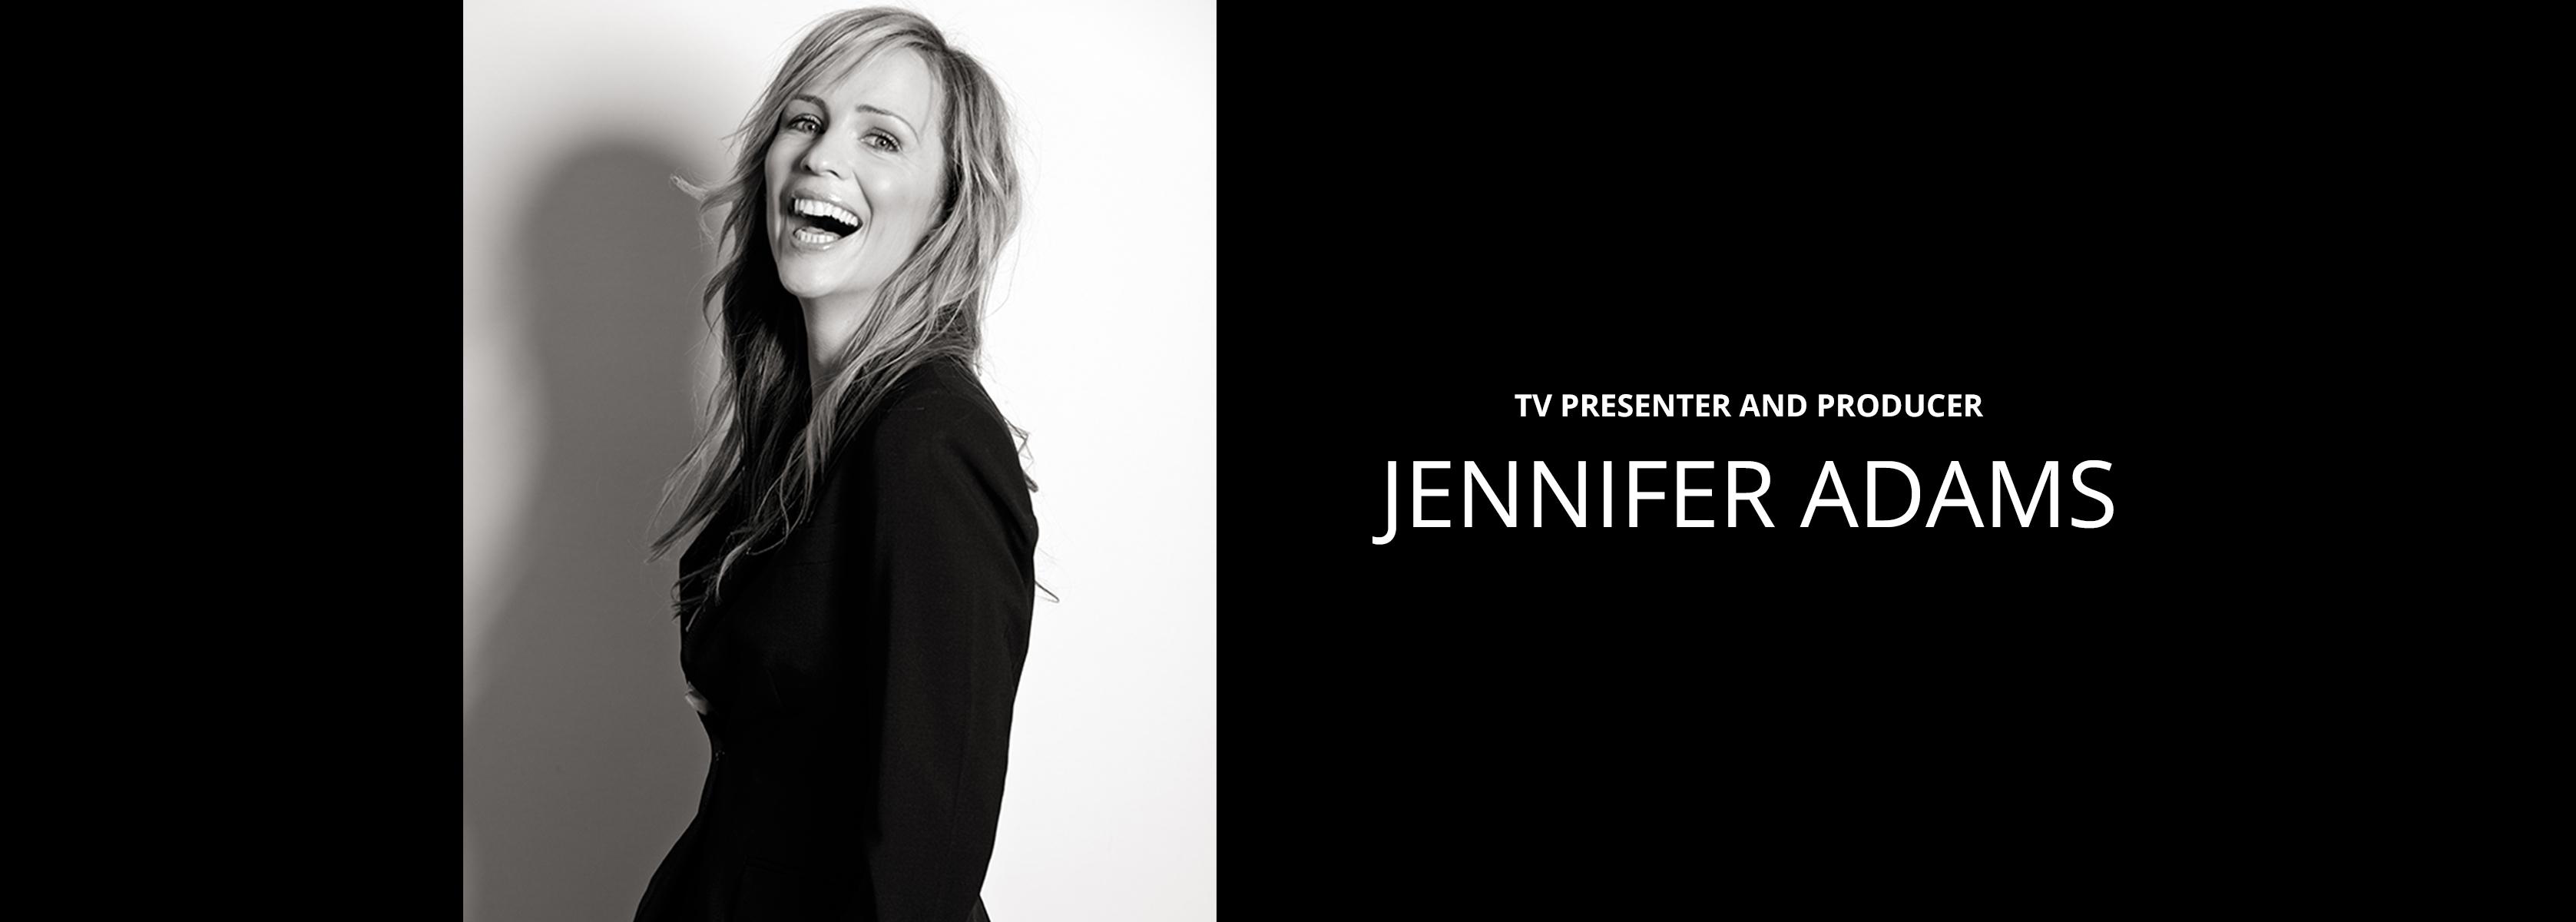 Jennifer Adams - TV Presenter and Producer - Bravo Talent Management